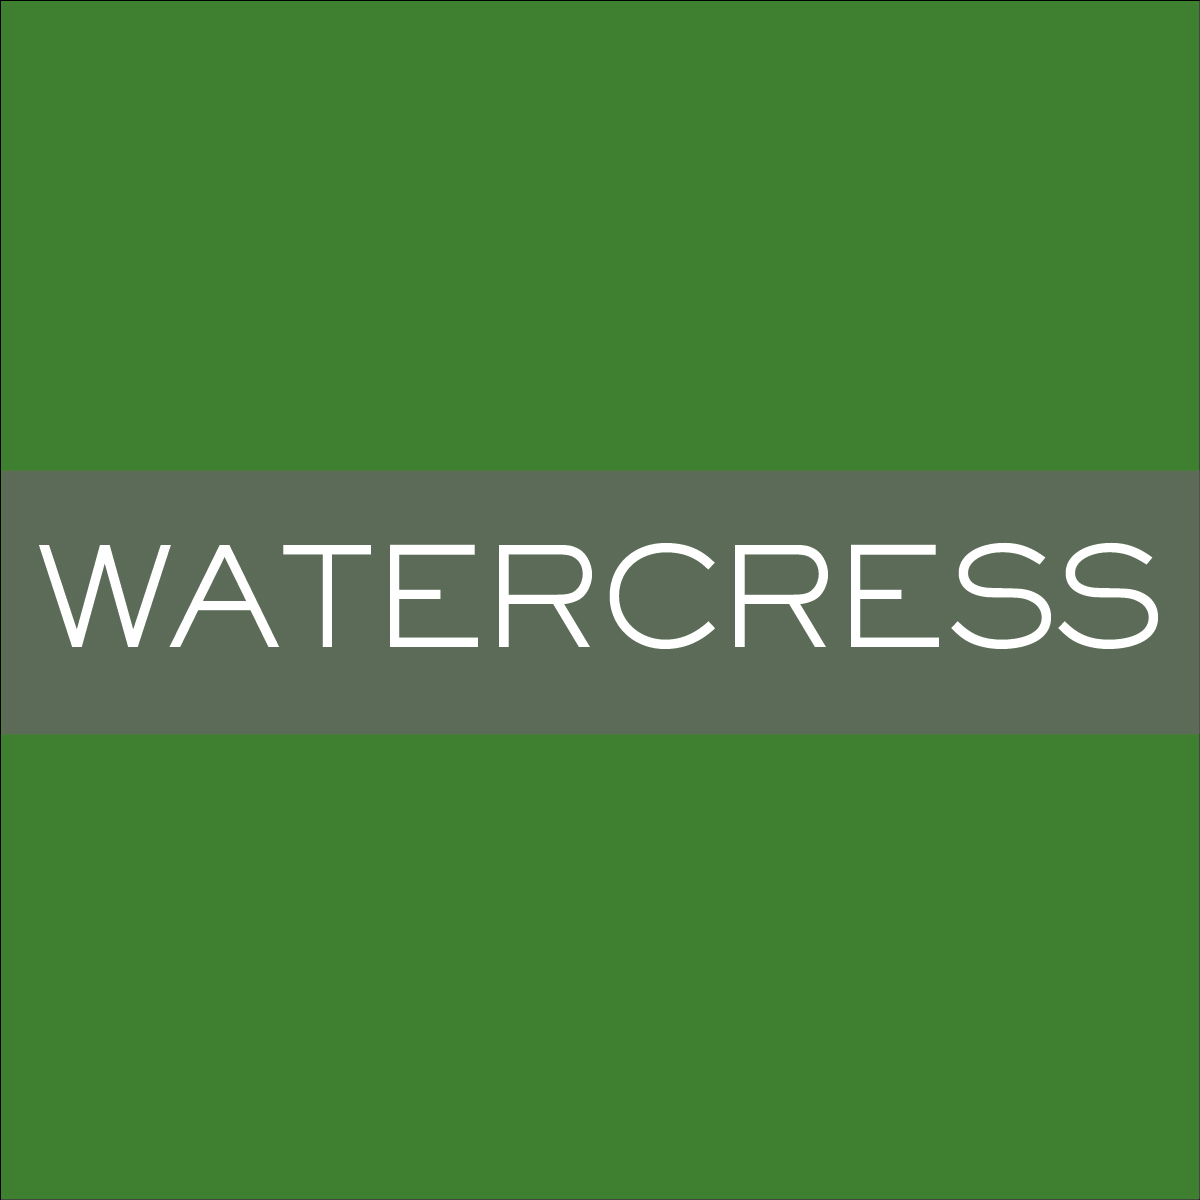 INK_Watercress.jpg